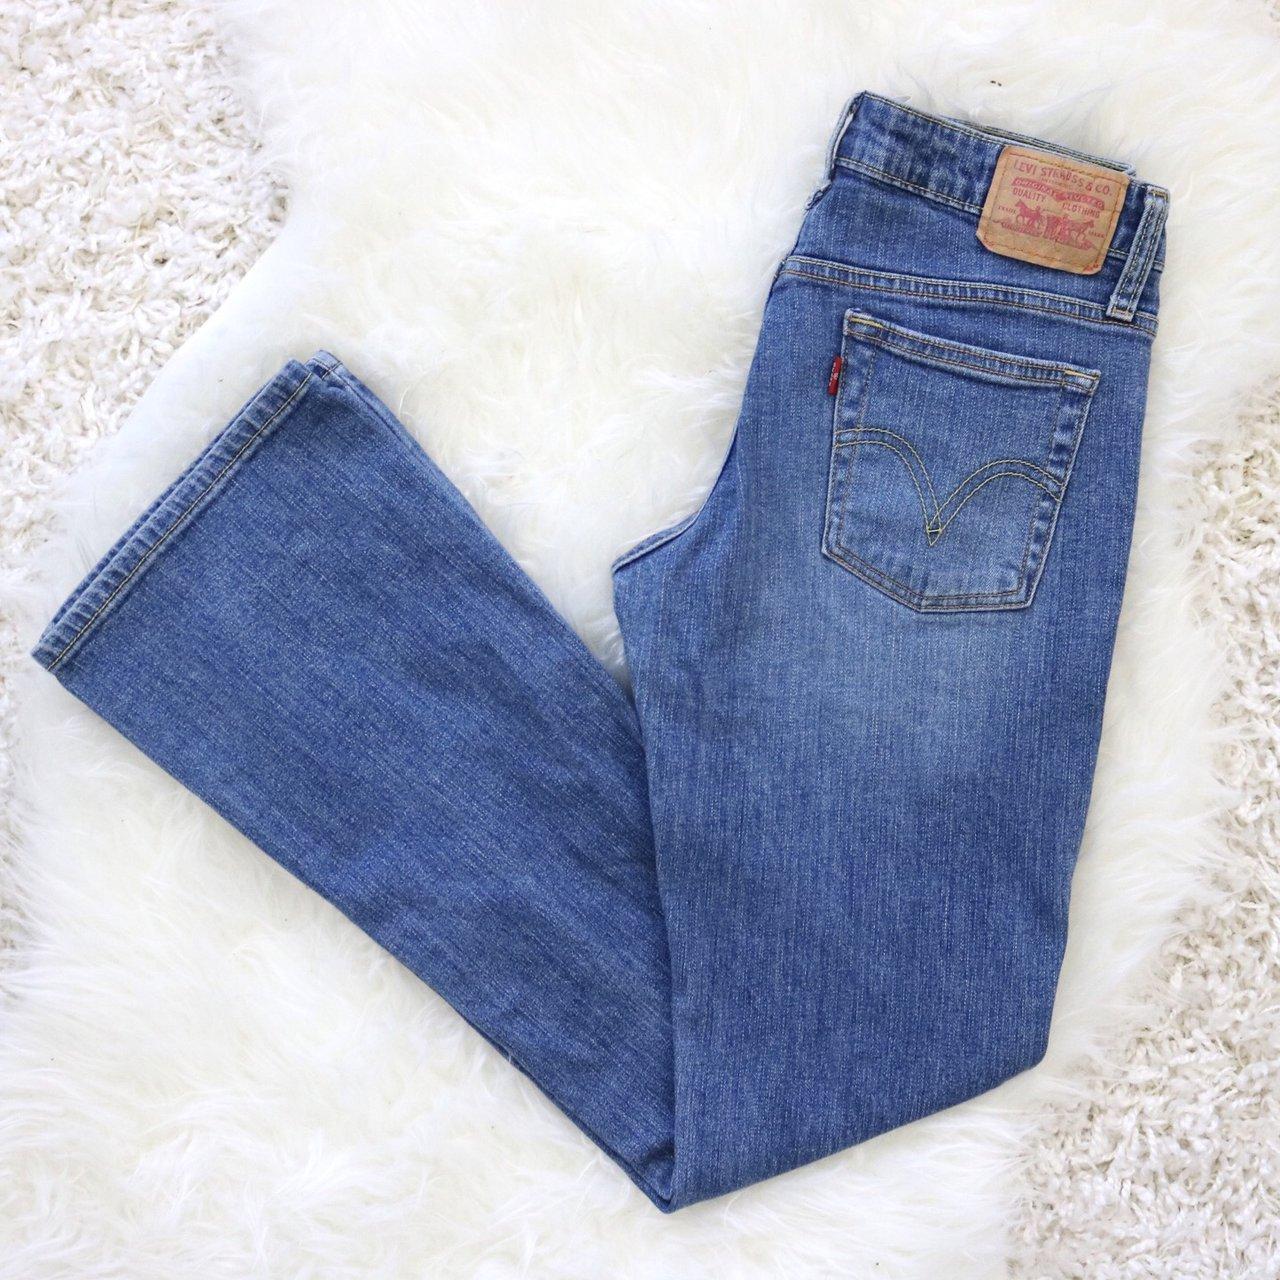 569cd8cf35e Levis 518 Superlow Bootcut Jeans | Kessler Ramirez – Art & Travel